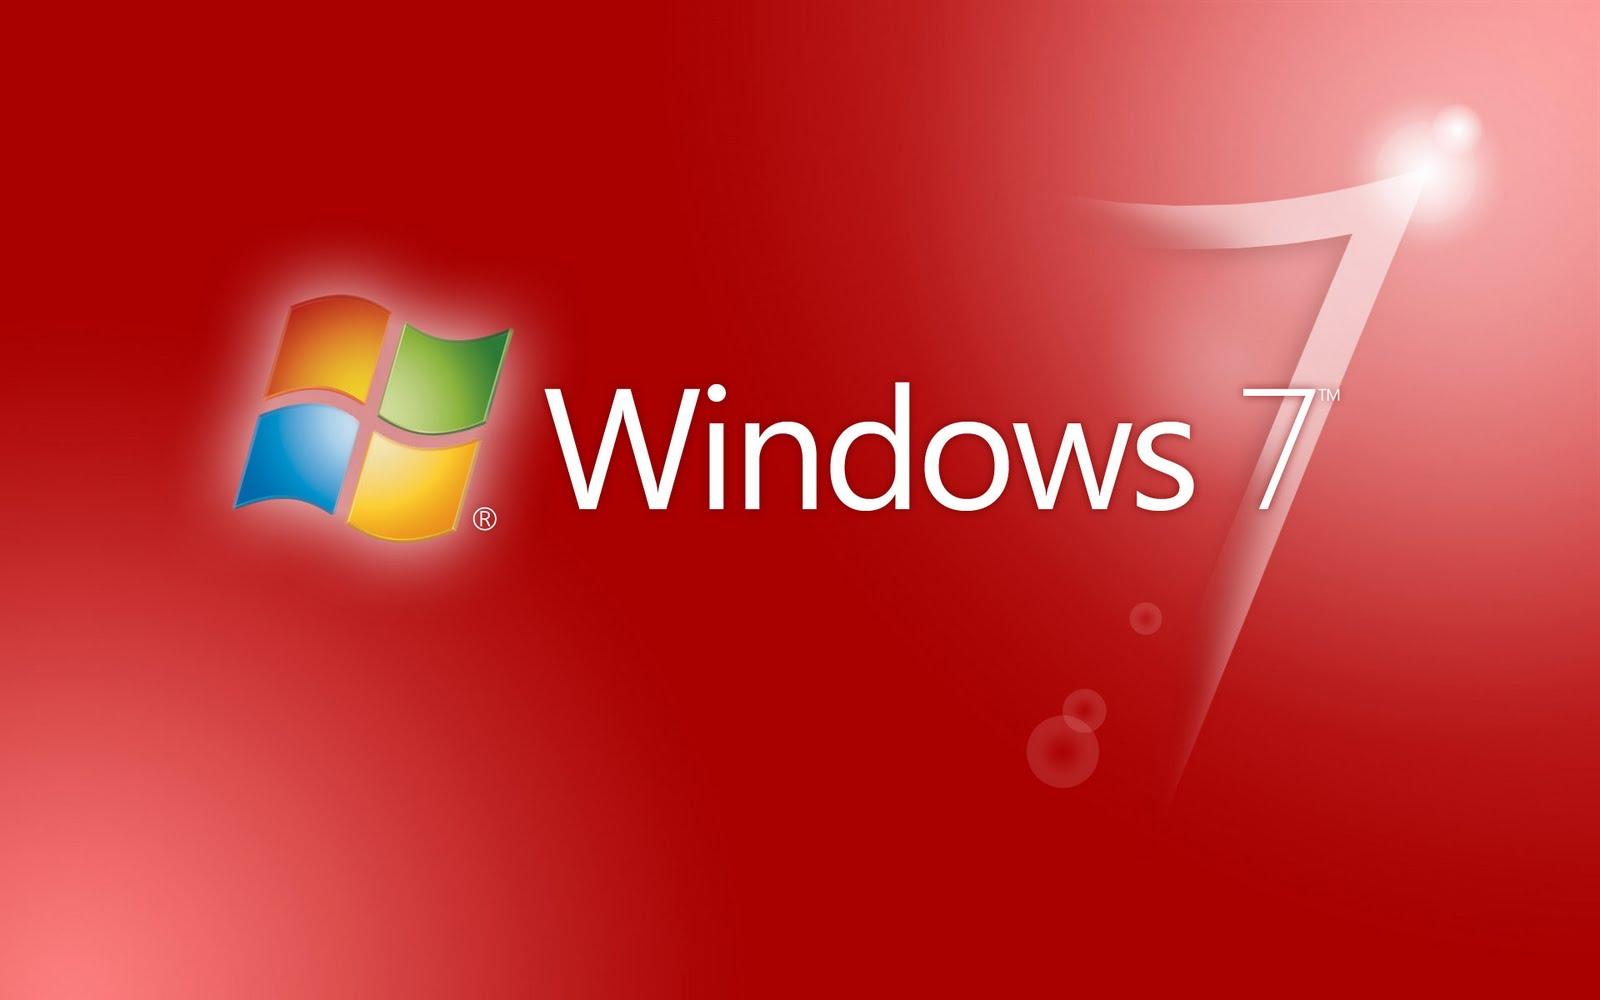 http://3.bp.blogspot.com/_Qc6aMdLT994/S6pU26QX7AI/AAAAAAAAFGM/8AHp9OzYttU/s1600/Windows%207%20ultimate%20collection%20of%20wallpapers%20(3).jpg